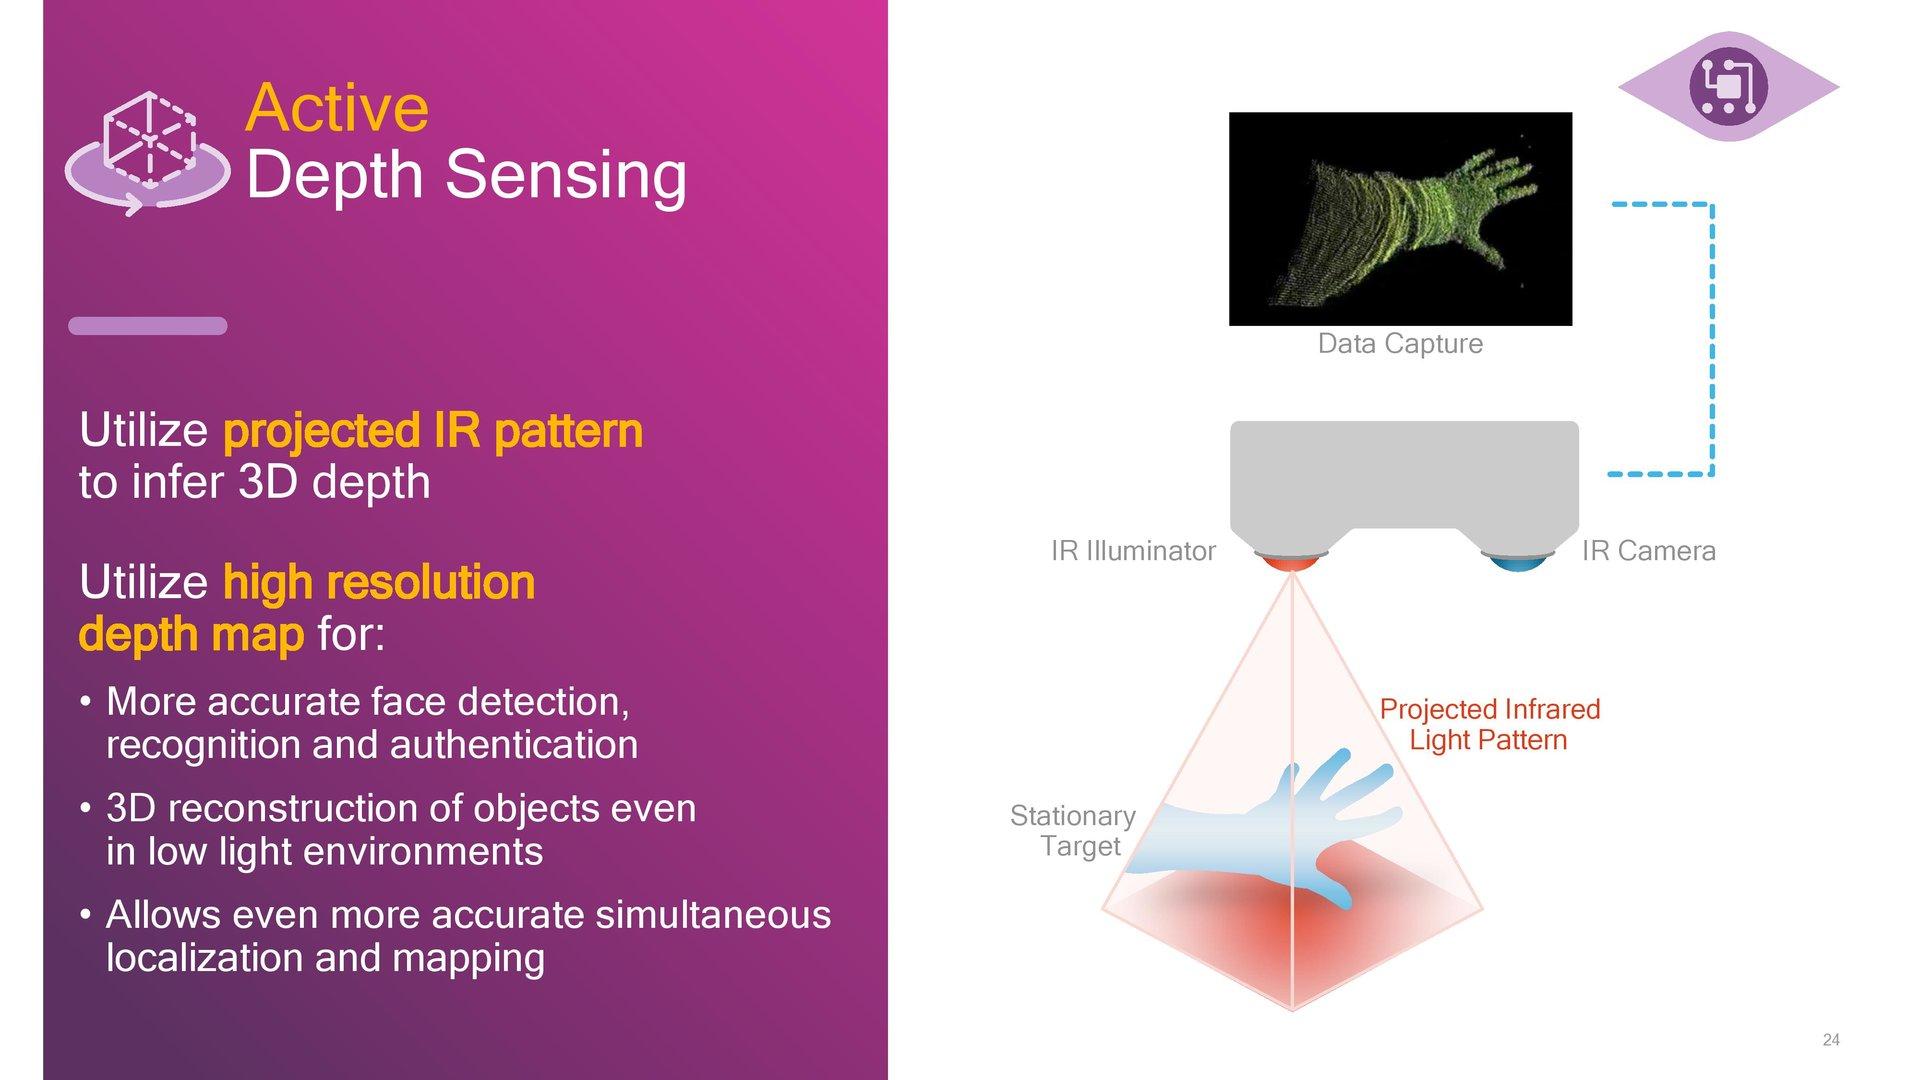 Active Depth Sensing